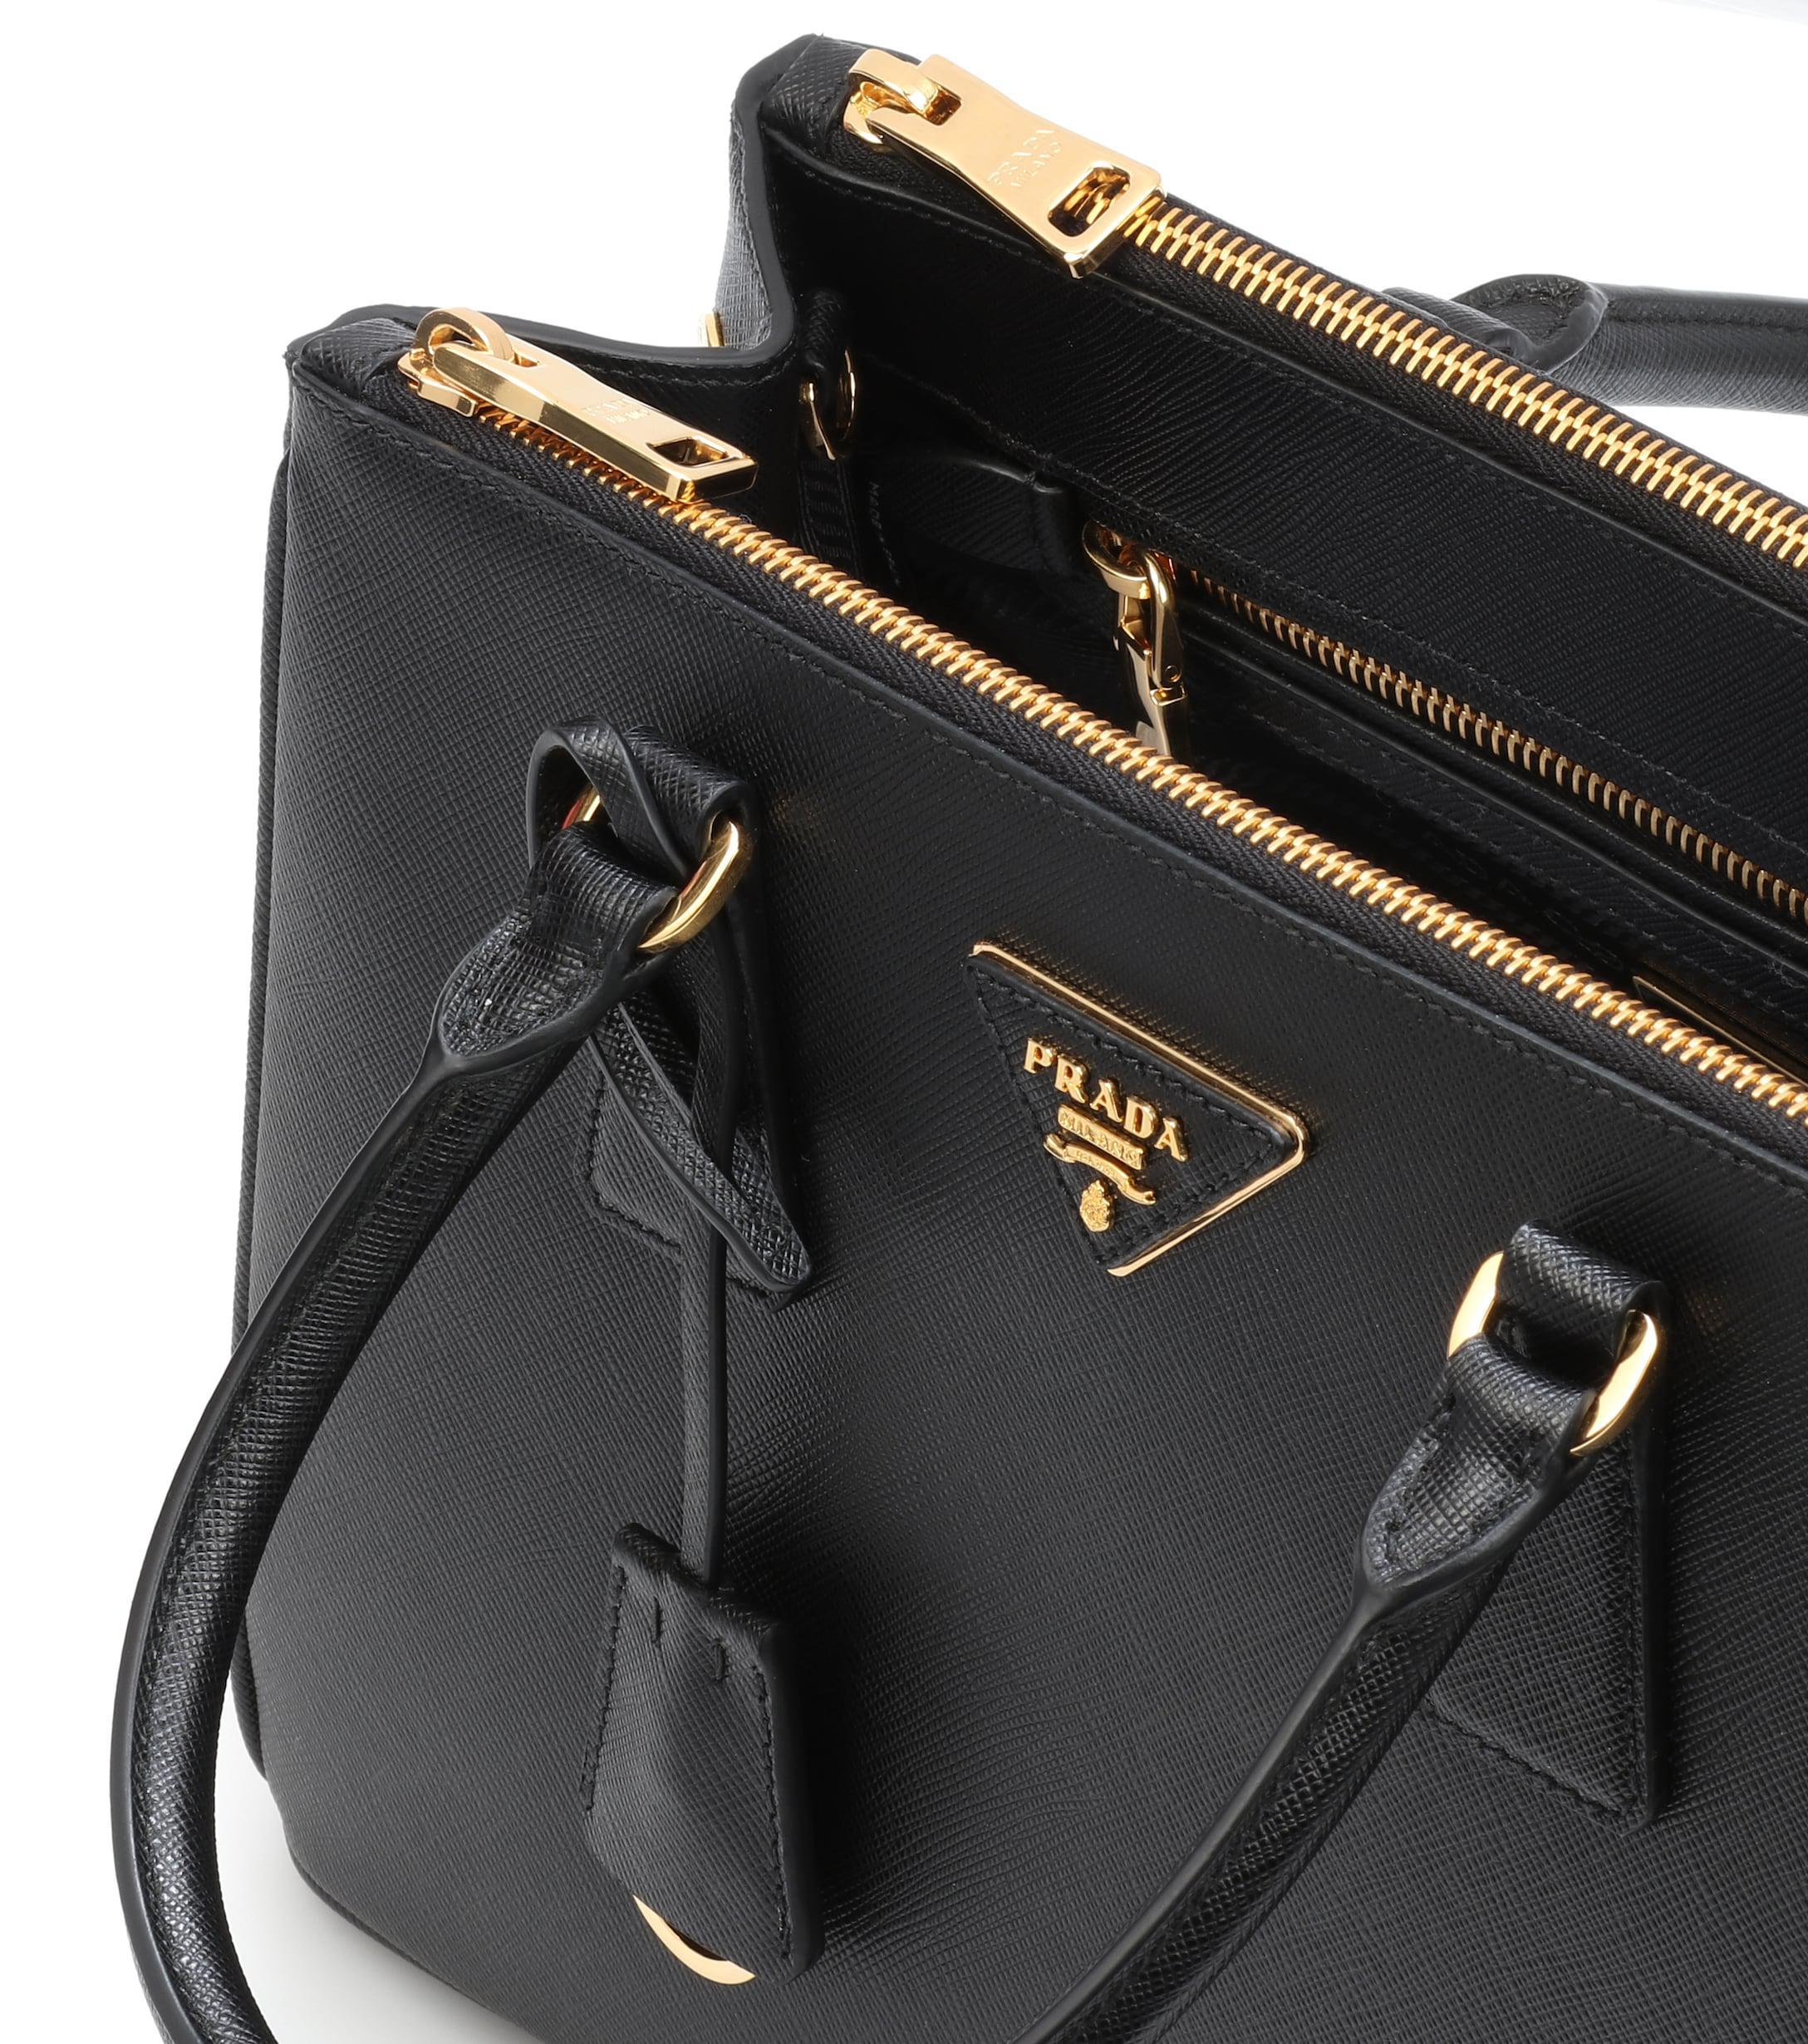 Lyst - Prada Galleria Saffiano Small Leather Shoulder Bag in Black b8258d1d03eb2